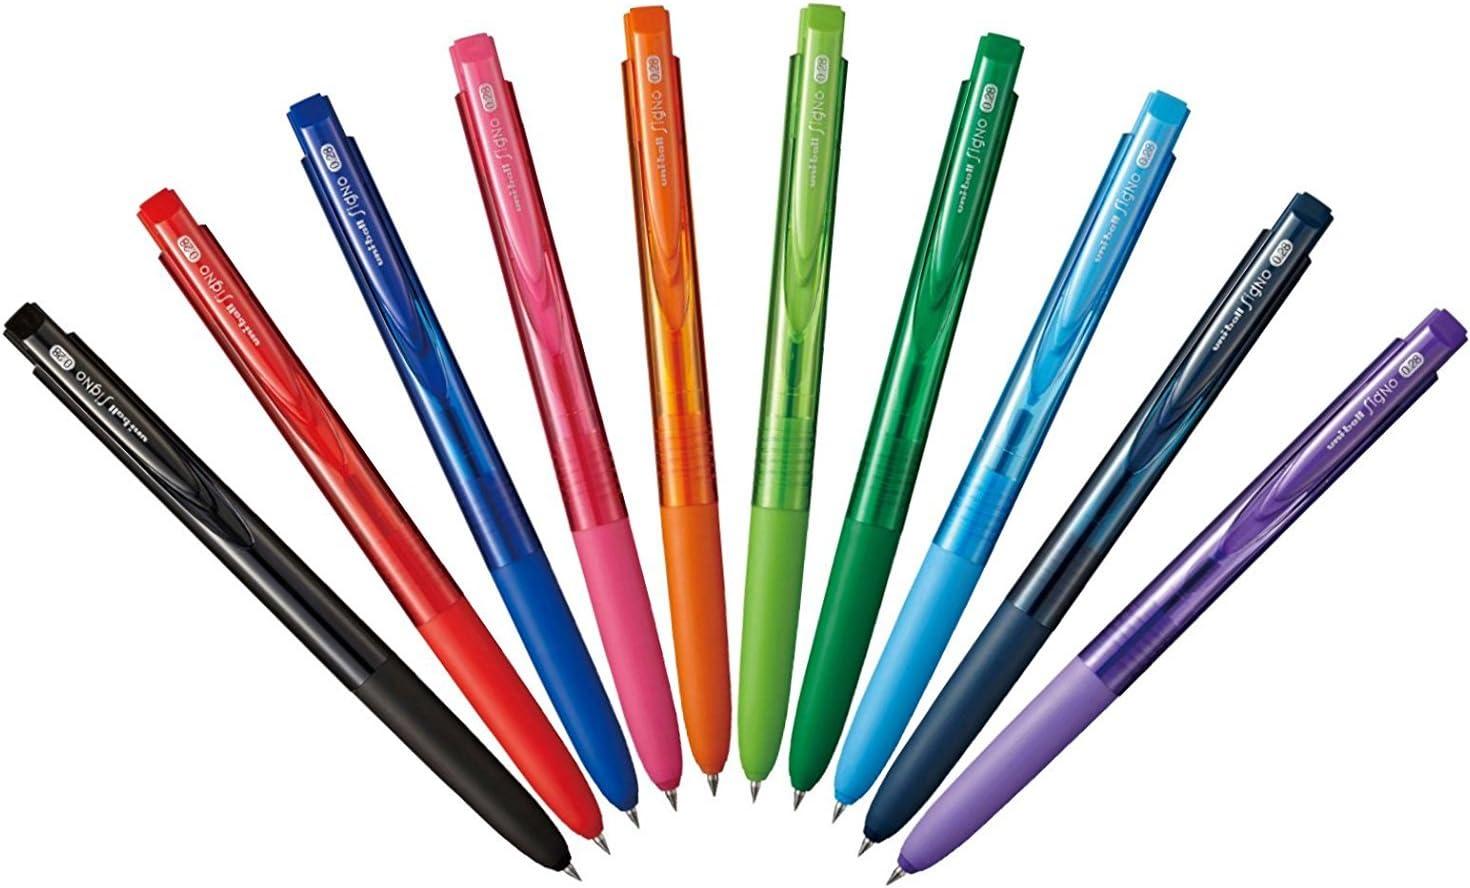 Azul-Negro 5 X Uni-Ball Signo RT UMN-155 0.5 mm Gel Rollerball Bolígrafo Retráctil